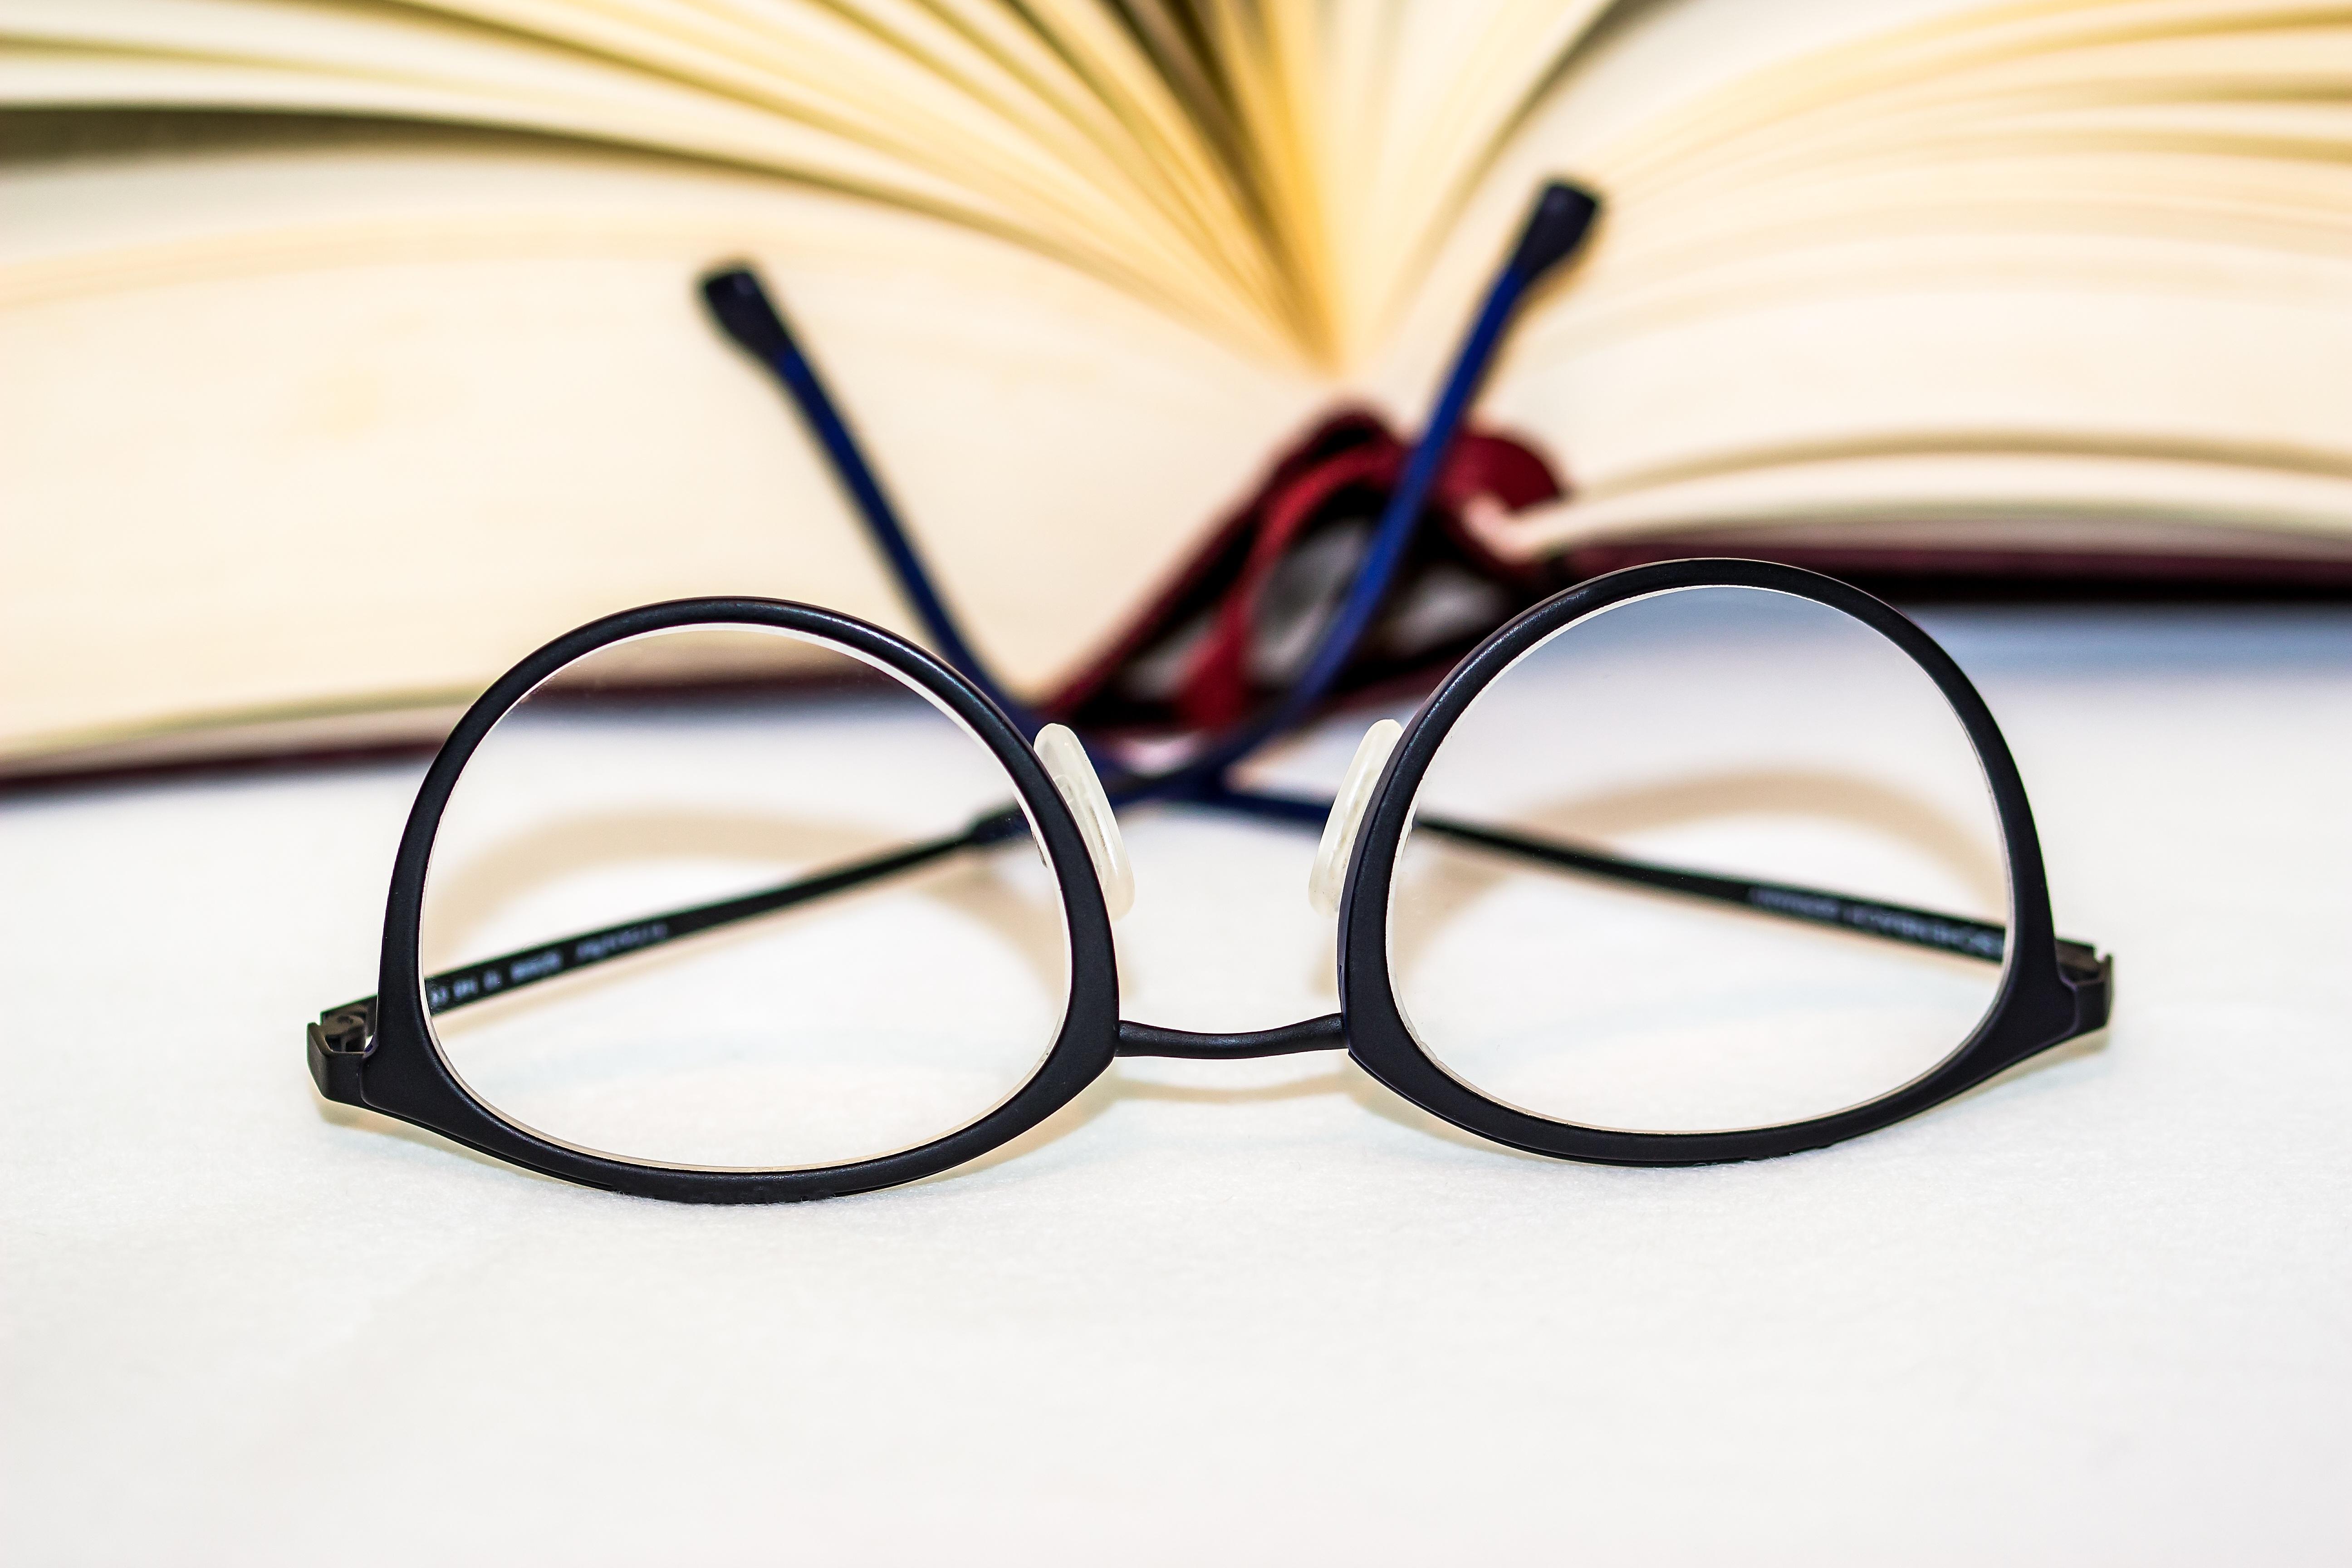 Free Images : open book, eyewear, sharpness, lenses, reading glasses